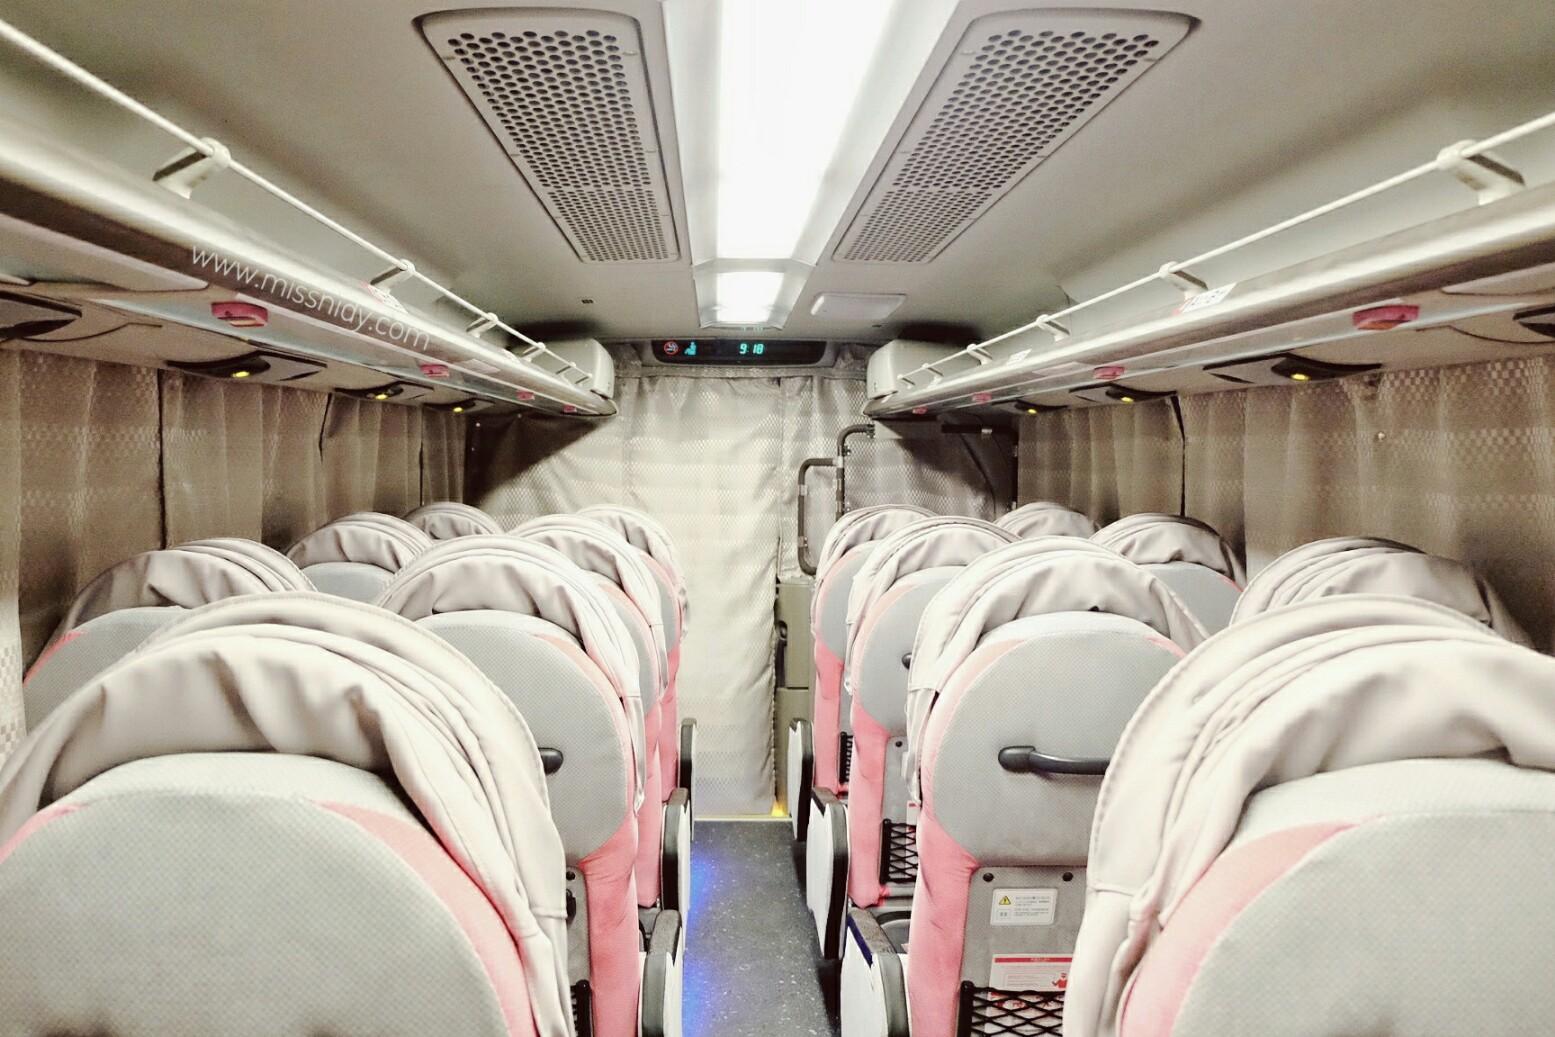 pengalaman naik bus malam di jepang